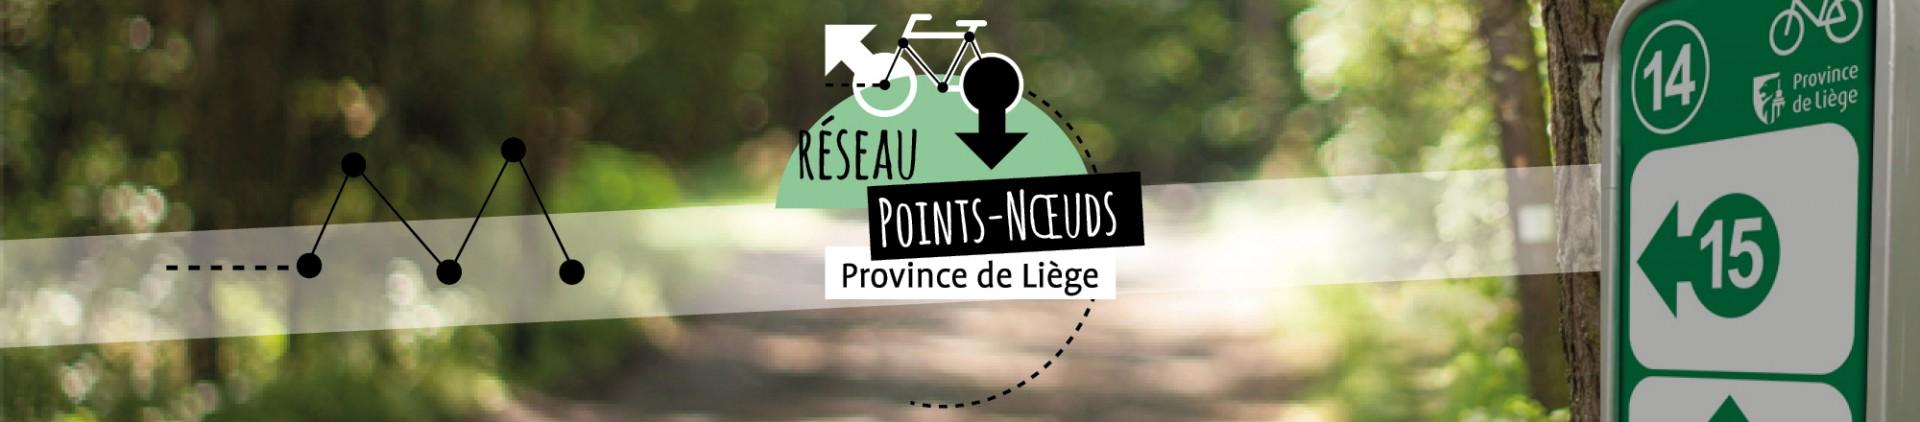 Planificateur points noeuds en province de Liège